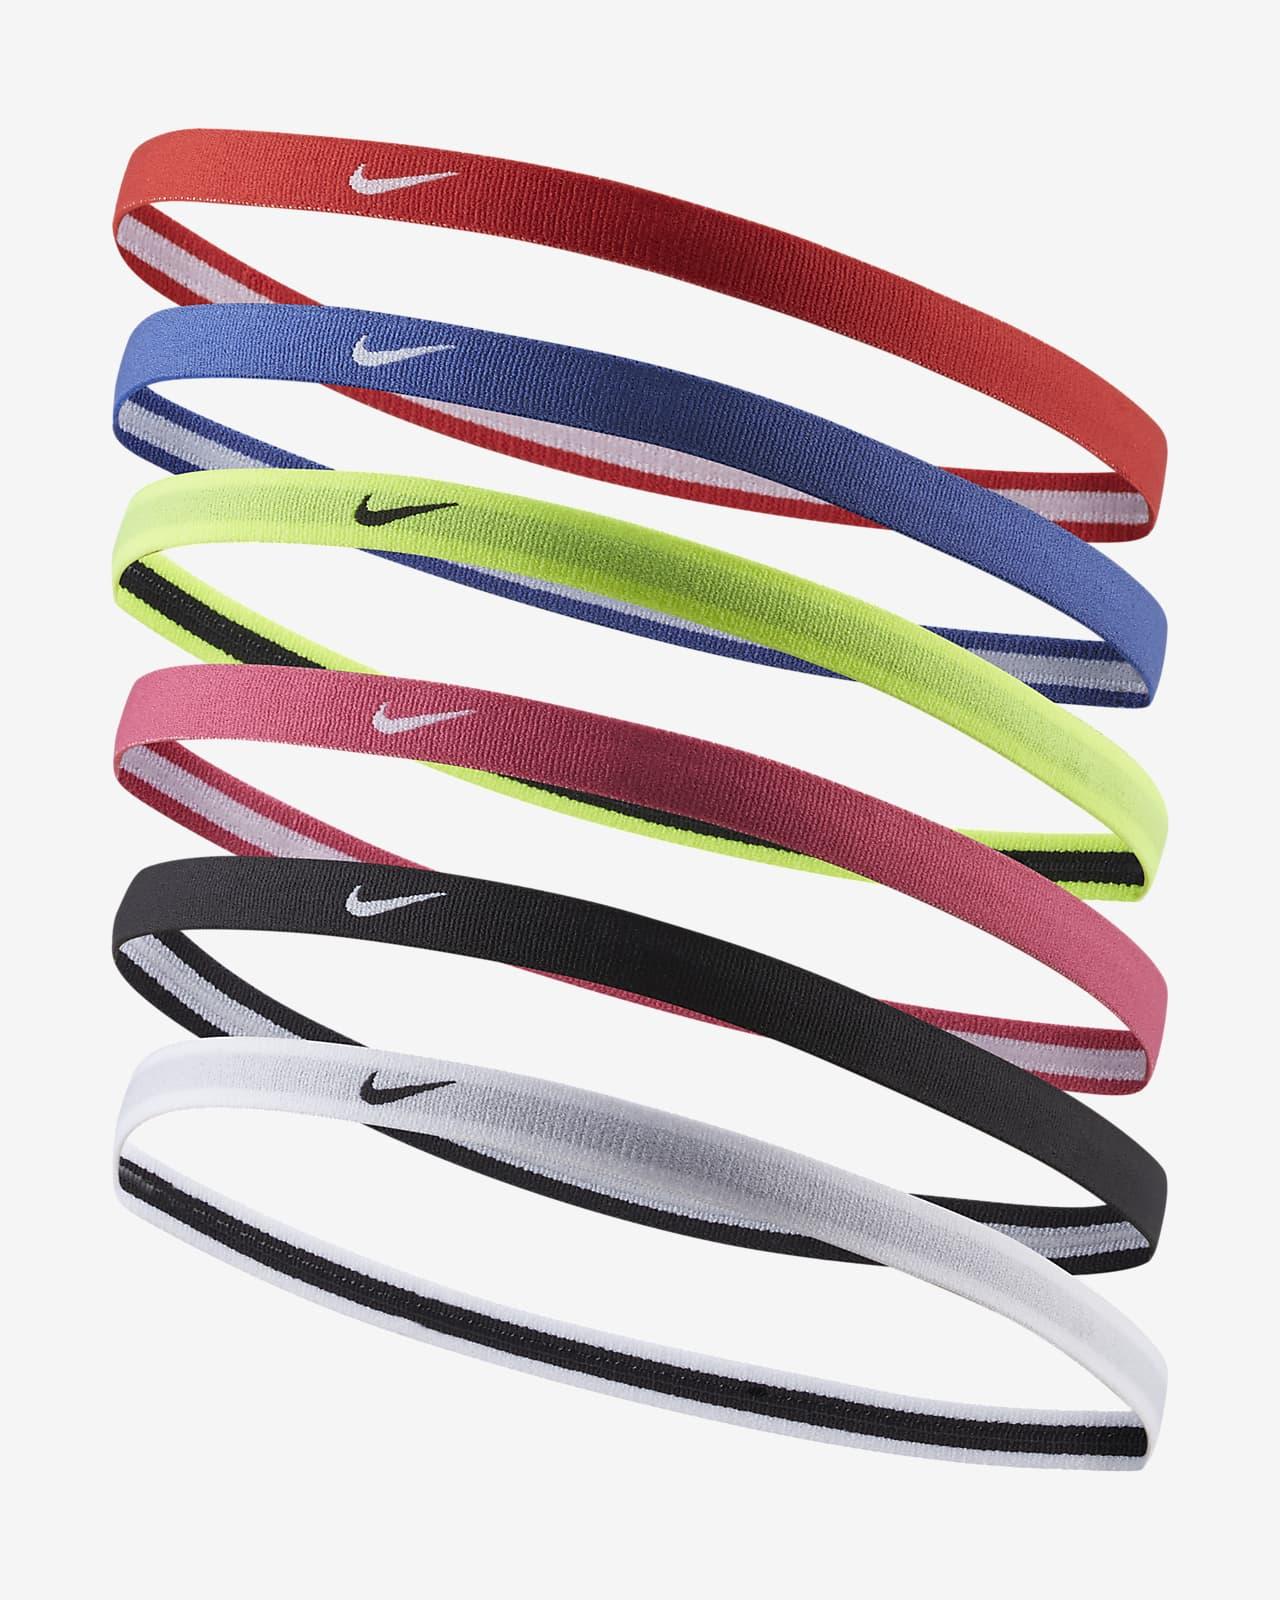 Nike Swoosh Kids' Headbands (6 Pack)